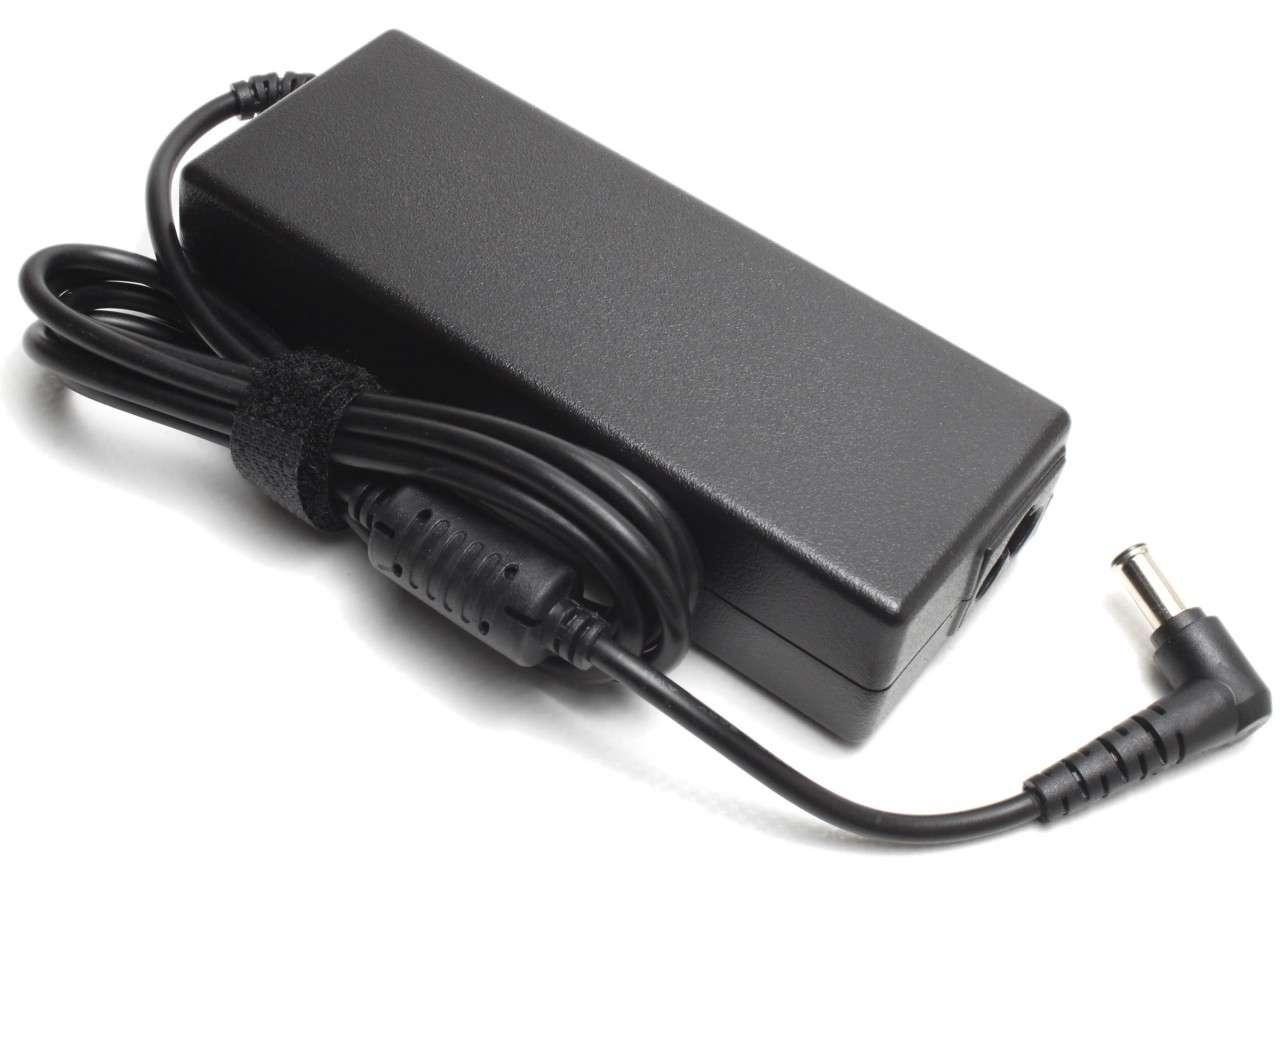 Incarcator Sony Vaio VPCEA44FX Replacement imagine powerlaptop.ro 2021